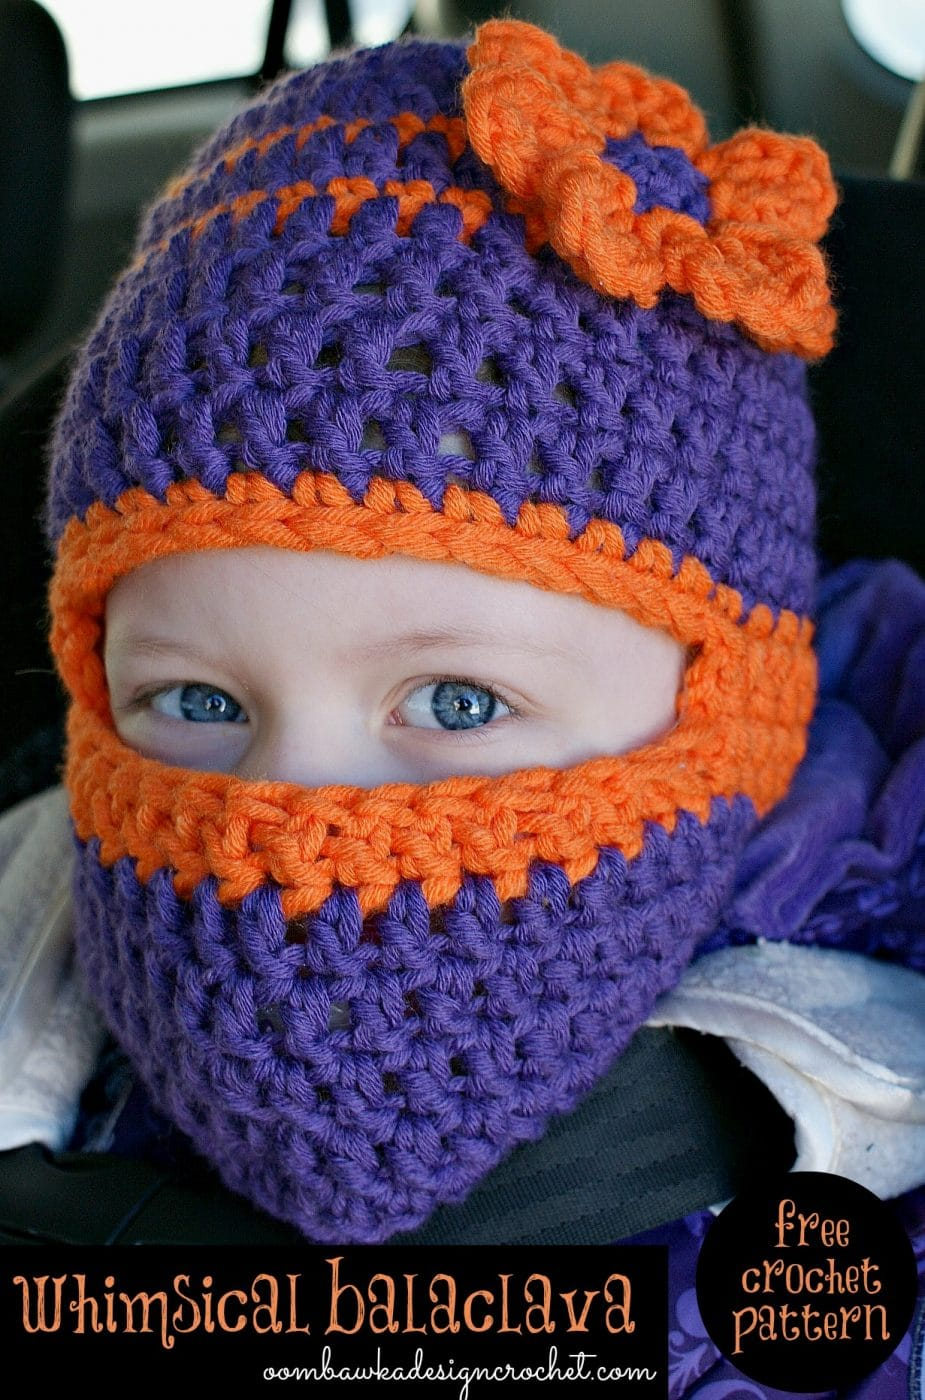 Whimsical Balaclava Free Crochet Pattern • Oombawka Design Crochet